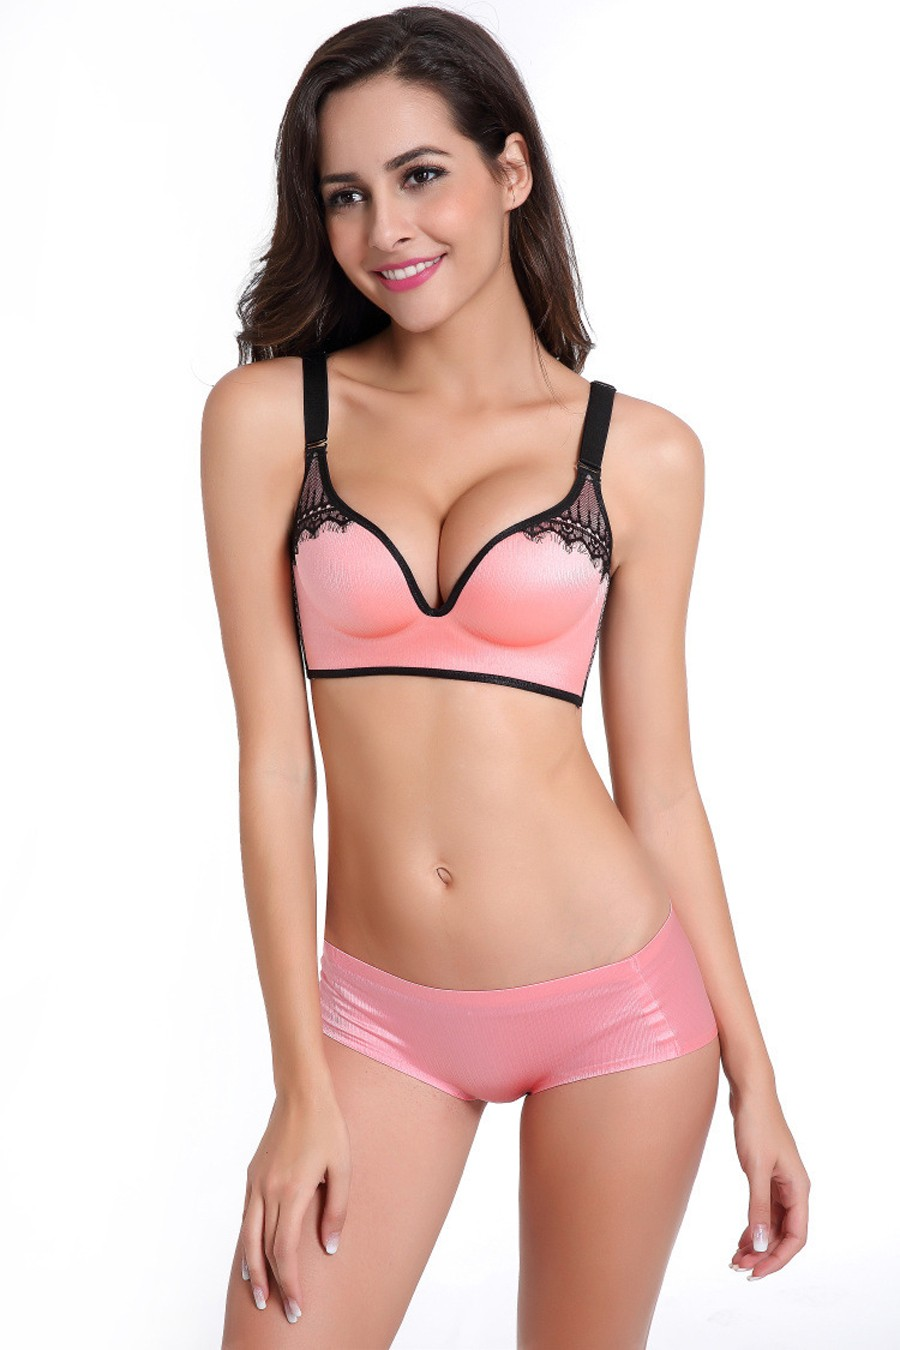 b50ef22b7de DeRuiLady New Women Sexy Bra Sets Seamless Bras BC Cup Size 32-40 Lingerie  Suit Bra Panties Women Underwear Push Up Bra Sets